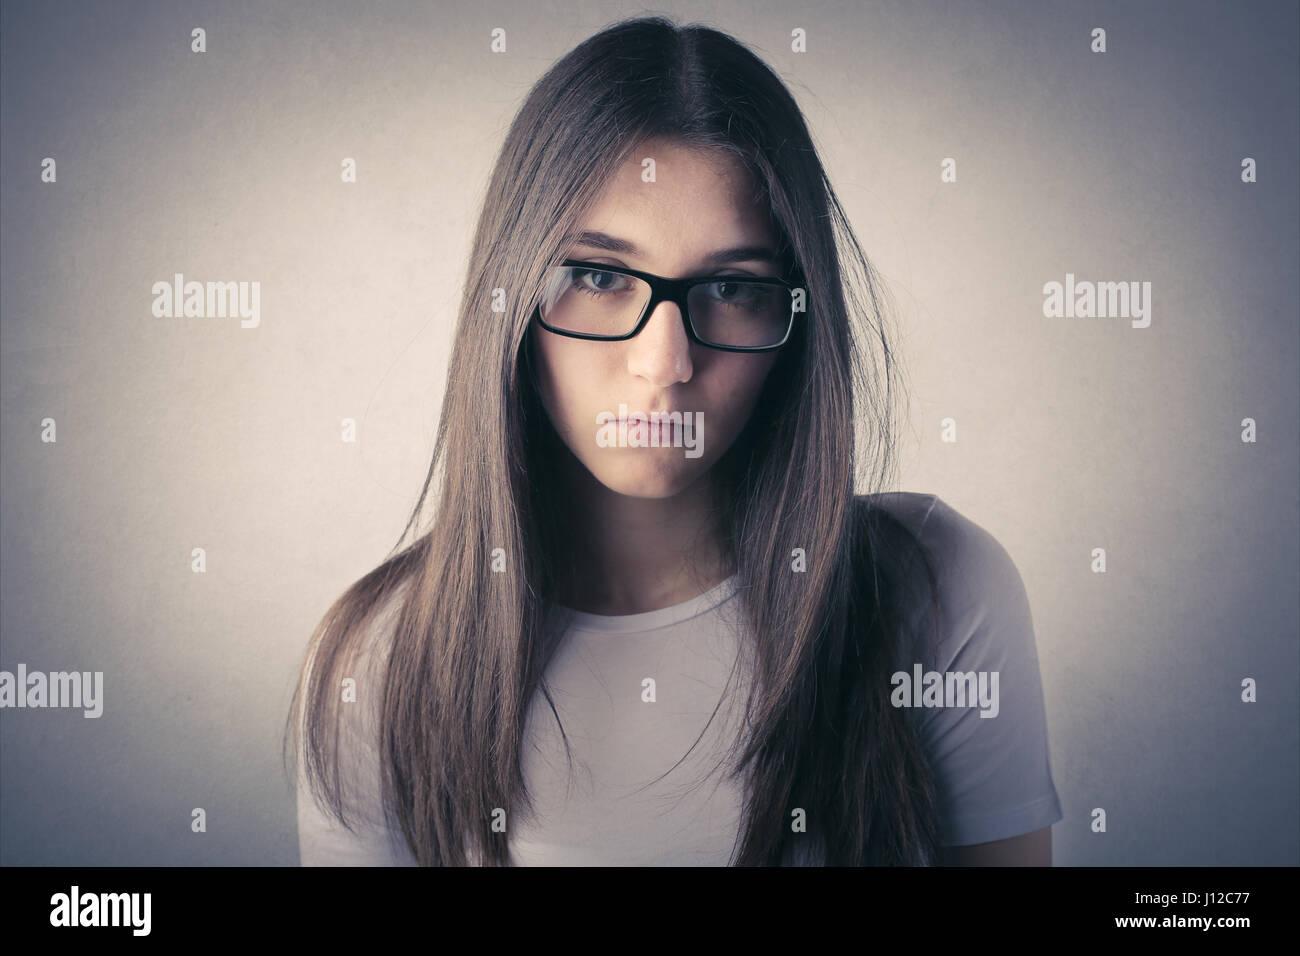 Mujer joven de gafas Imagen De Stock